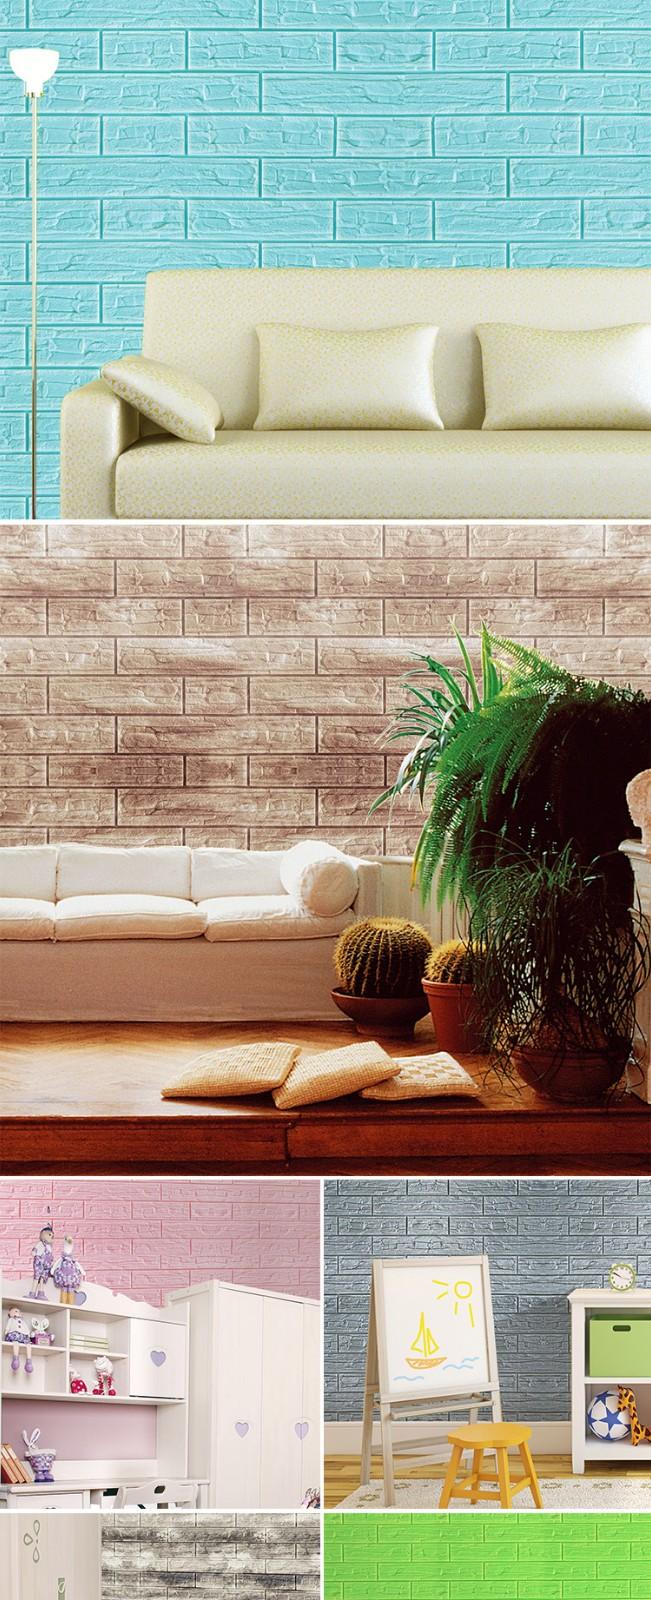 SUNYE soft foam tiles suppliers for canteen-4